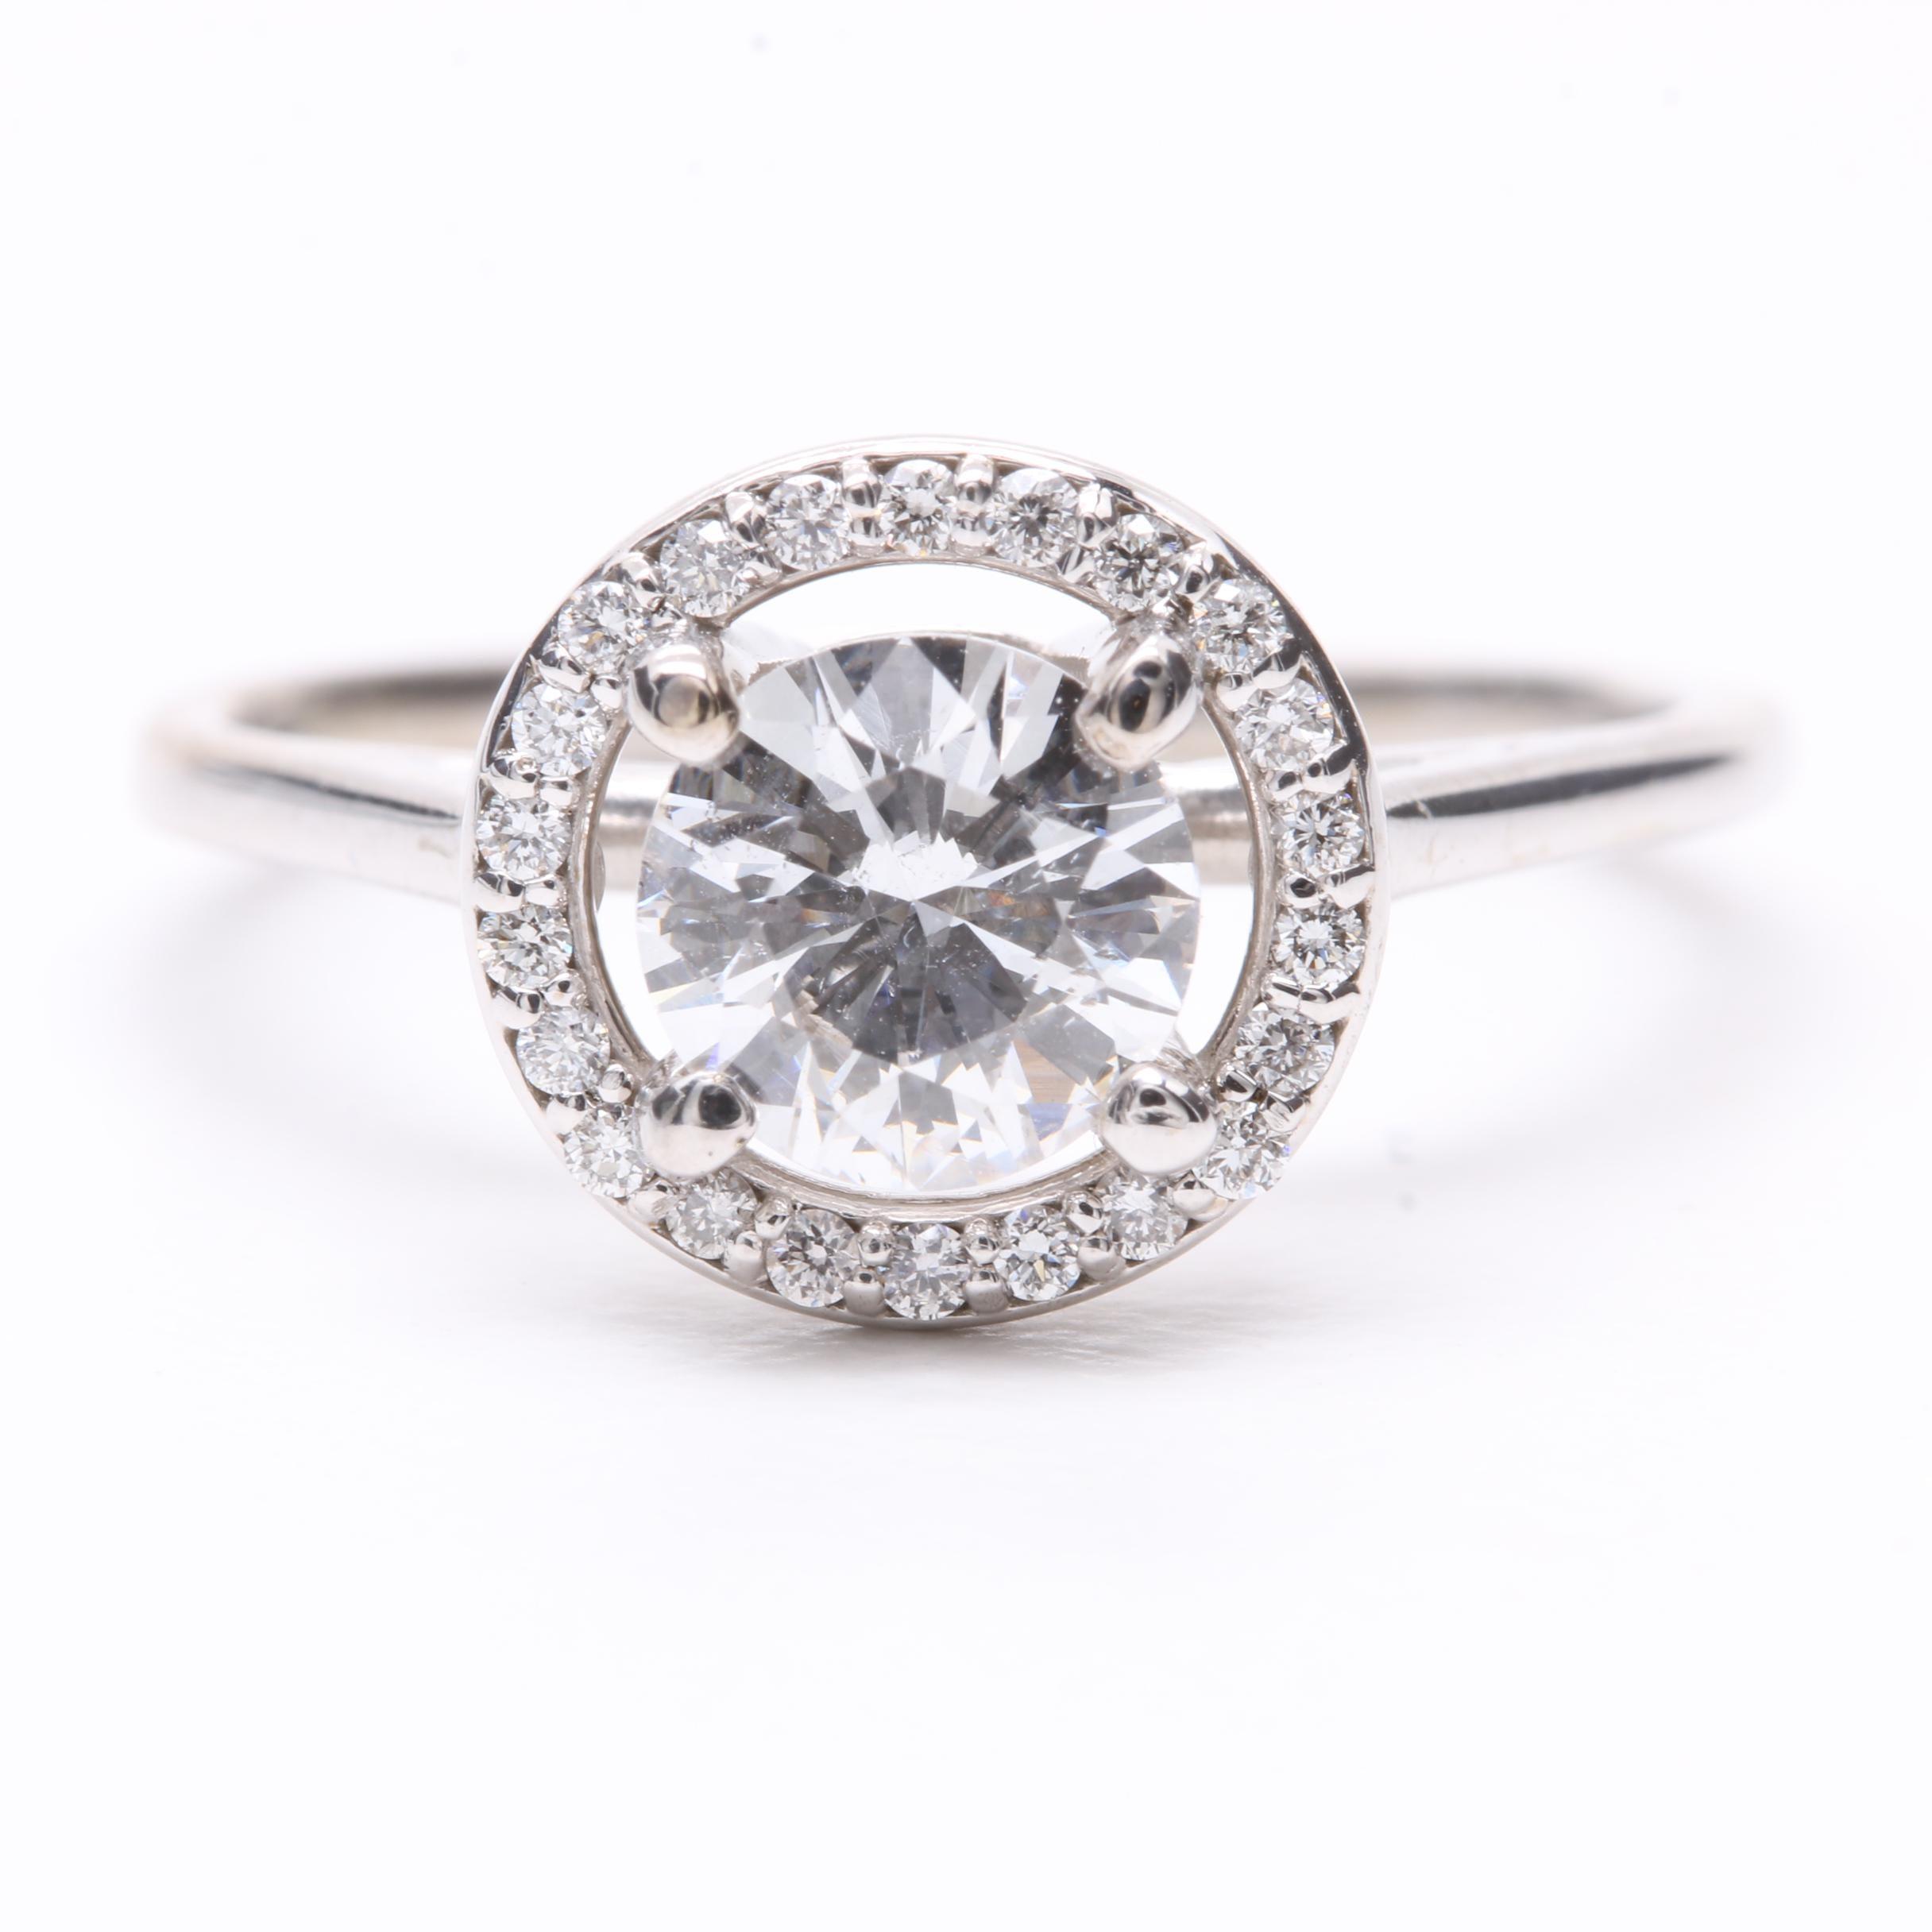 14K White Gold 0.96 CTW Diamond Ring